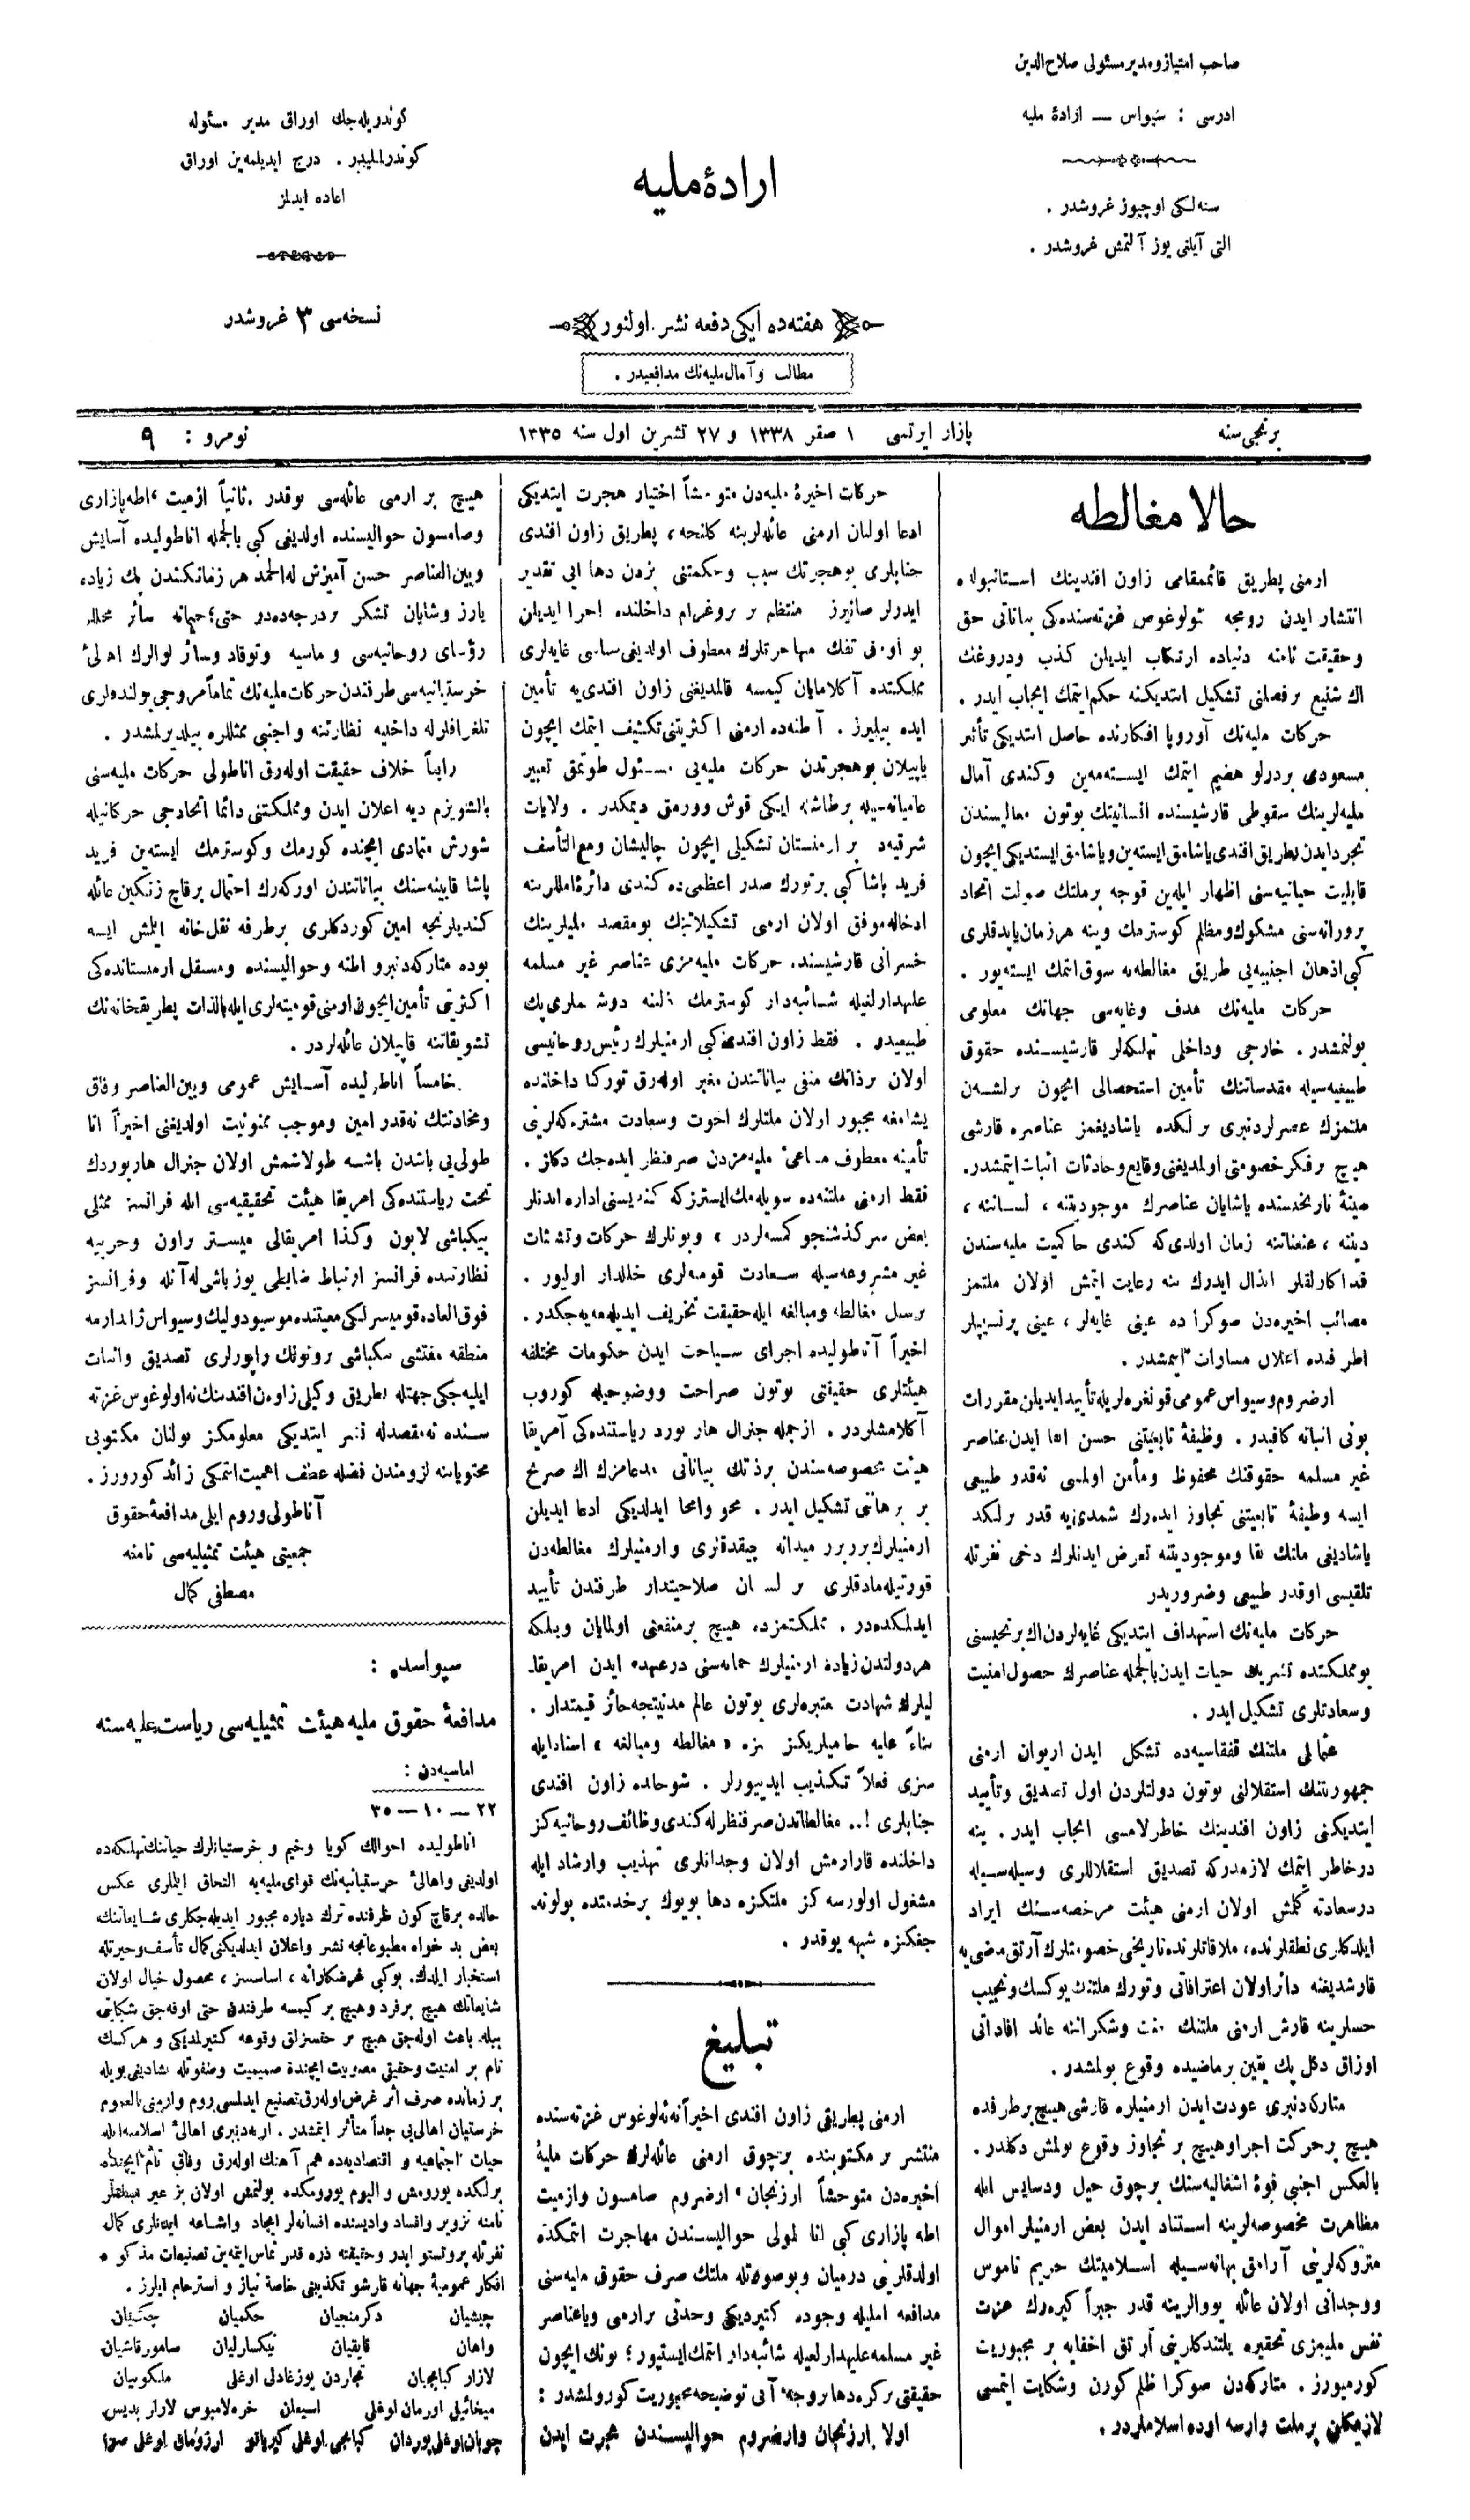 27 Ekim 1919 Tarihli İrade-i Milliye (Sivas) Gazetesi Sayfa 1